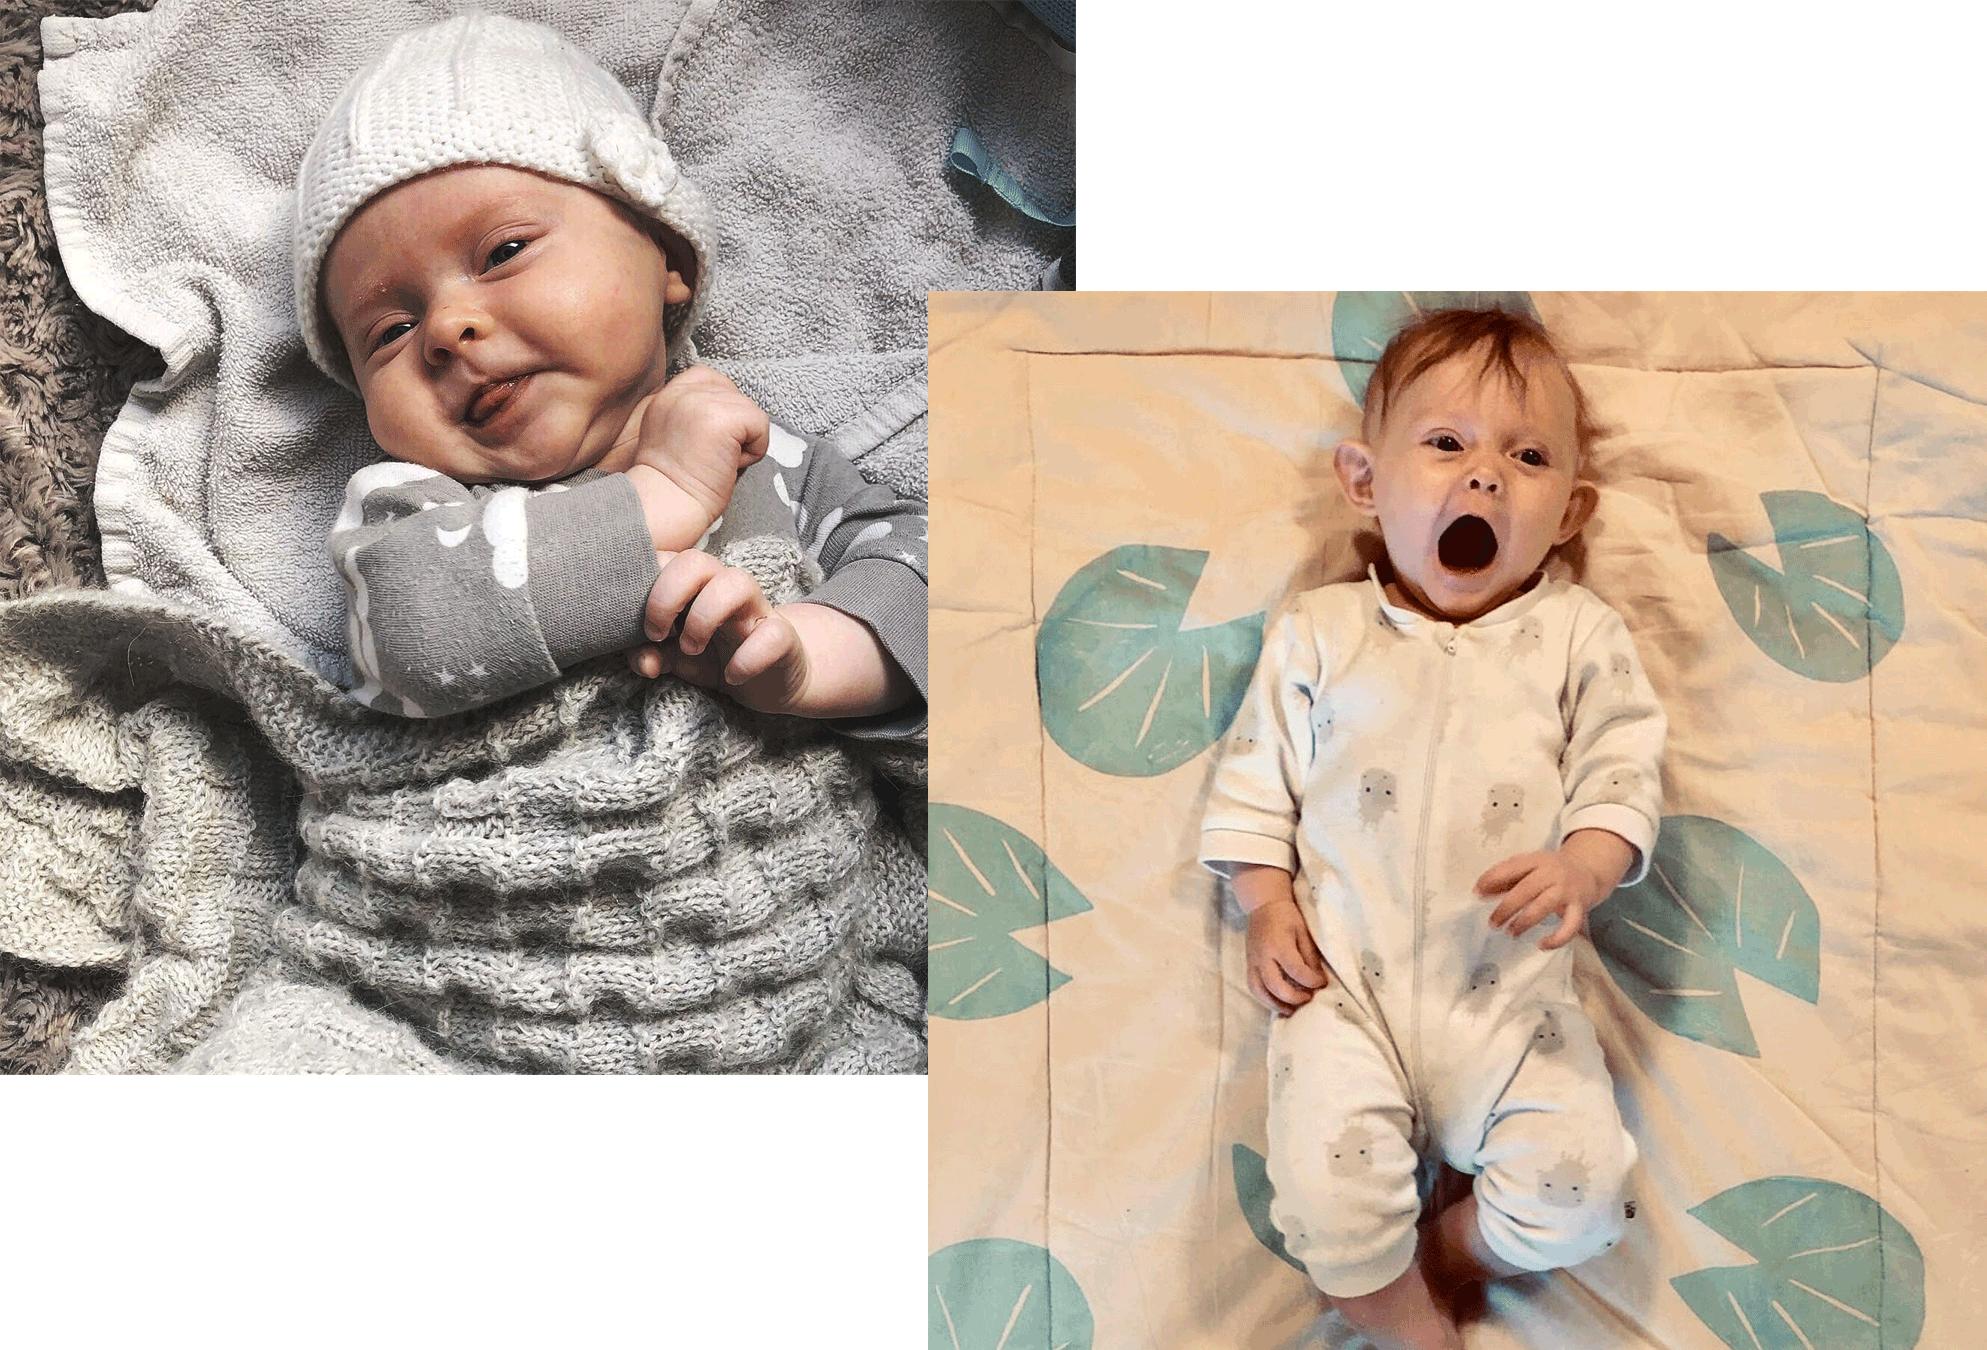 framkalla-bilder-bebis-poster.png